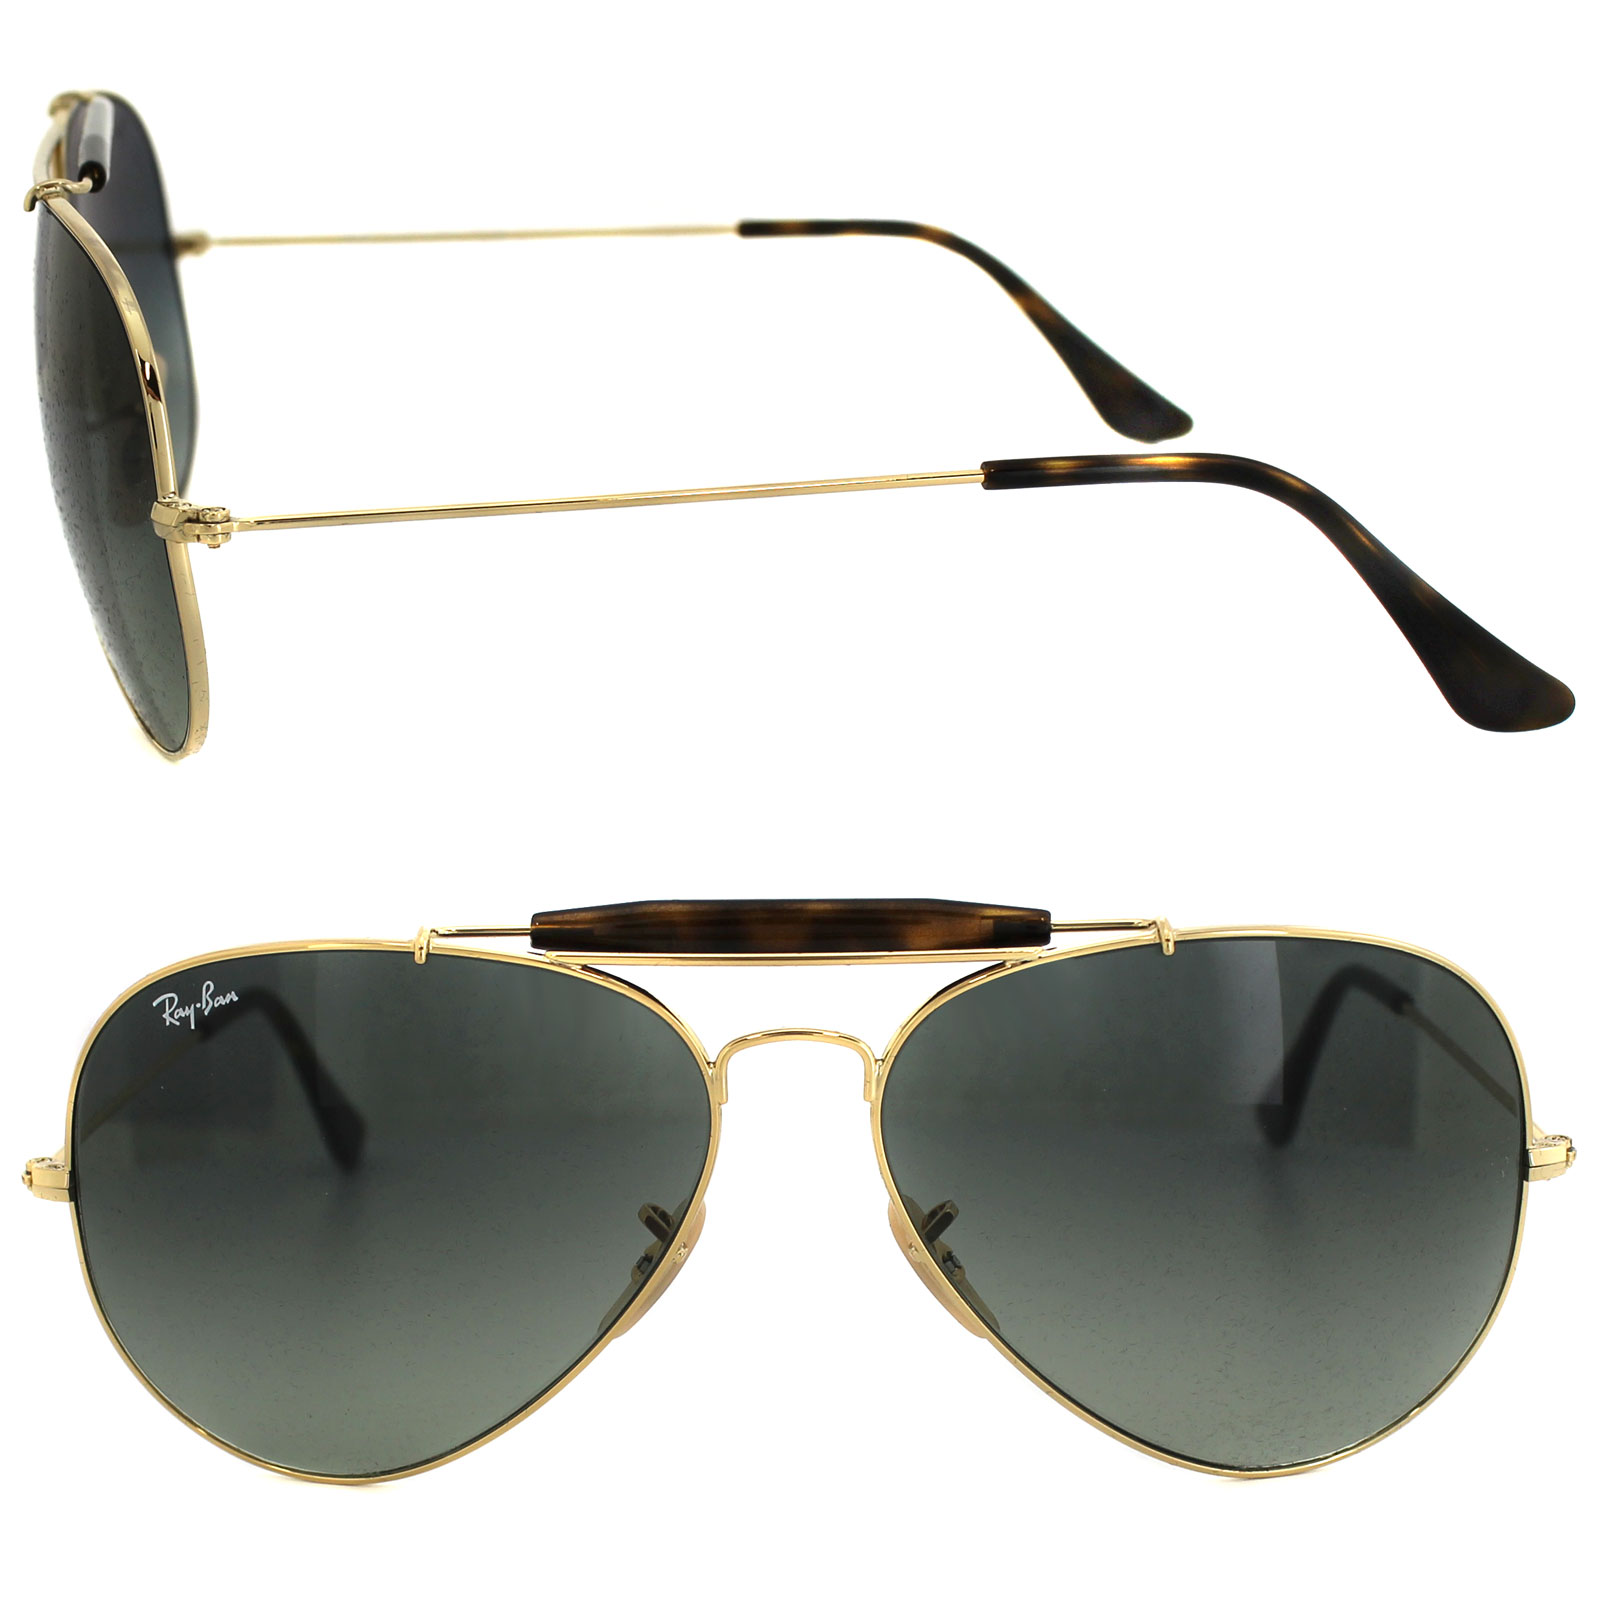 ca7ef10435 Sentinel Ray-Ban Sunglasses Outdoorsman Havana 3029 181 71 Gold   Havana  Grey Gradient